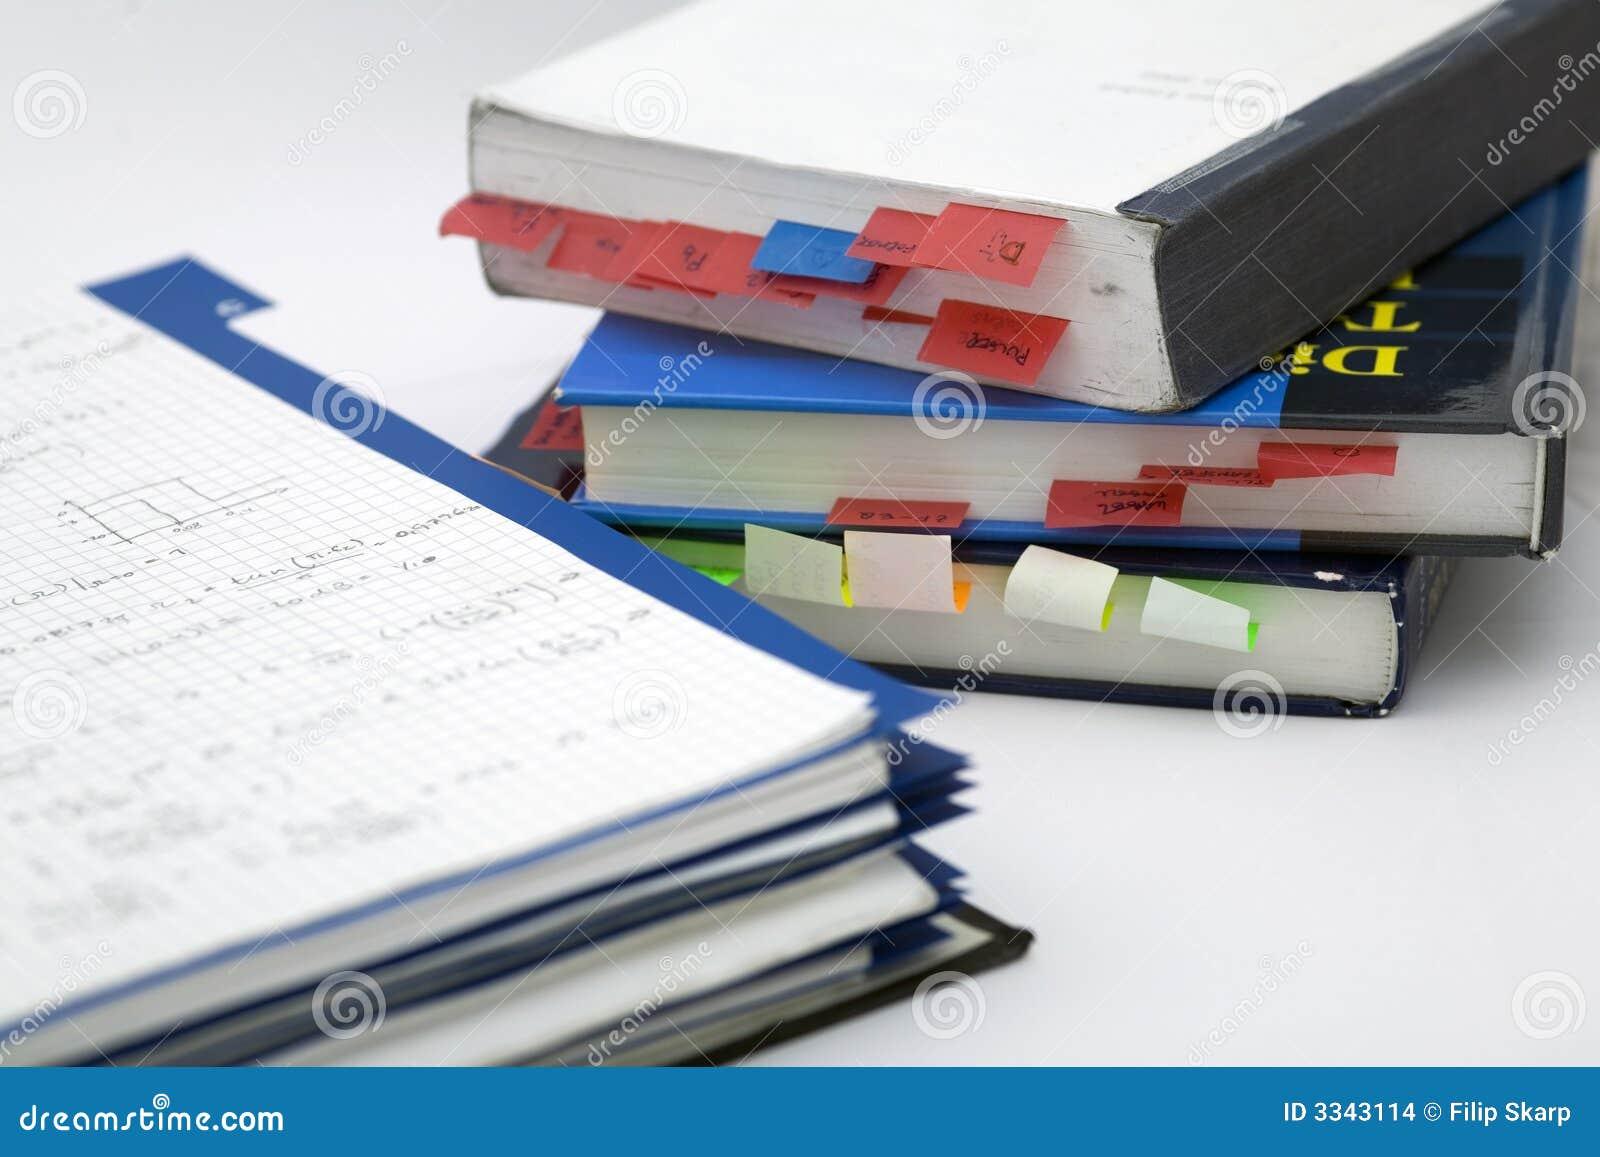 Advanced Math And Book